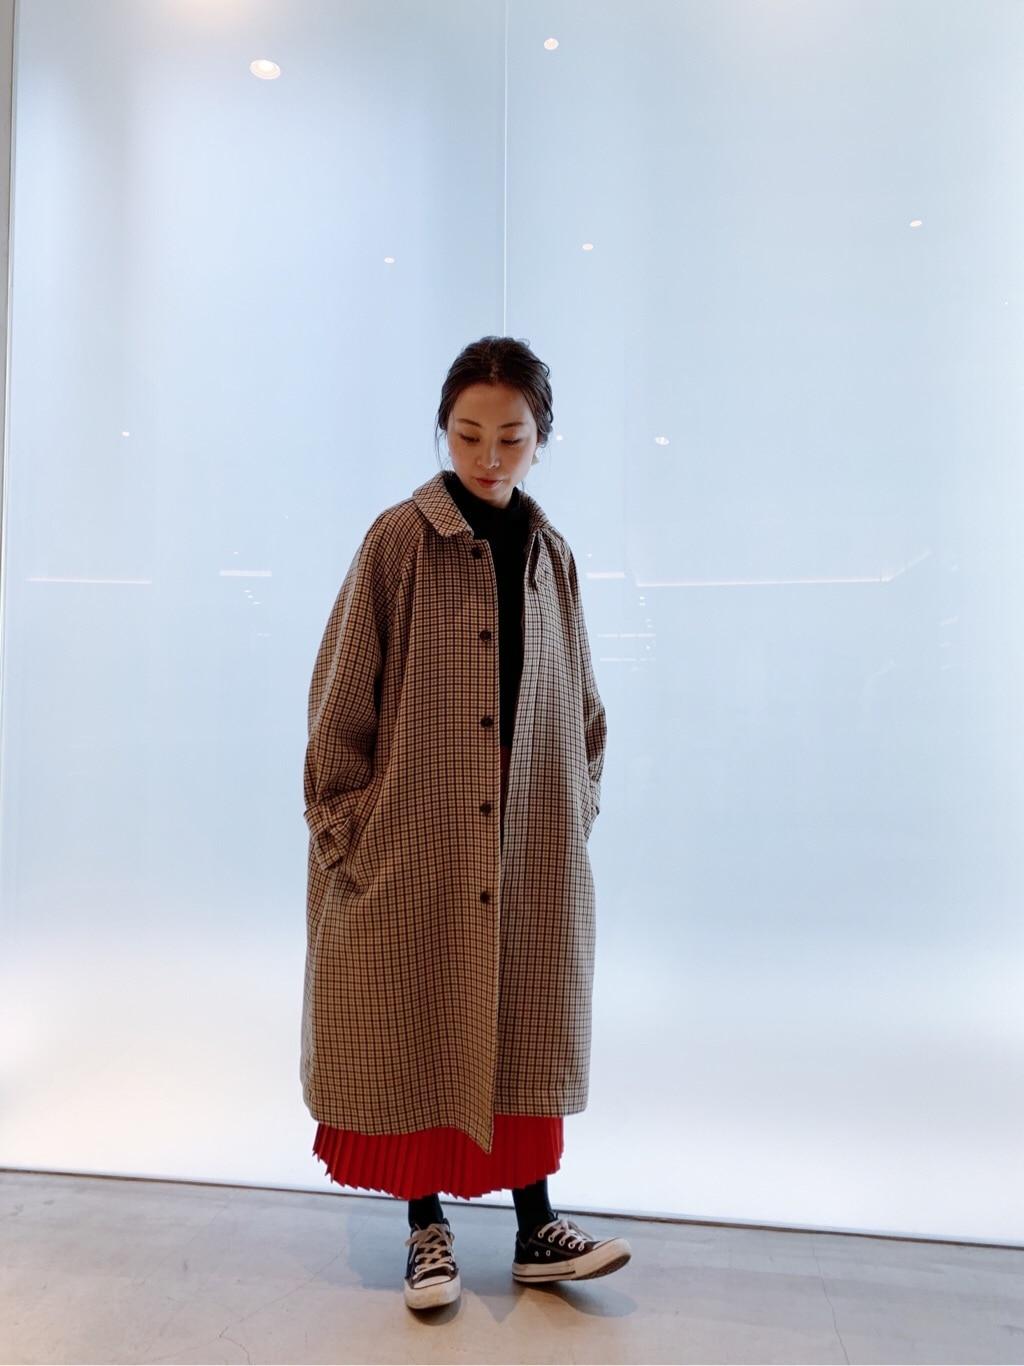 note et silence. 日本橋��島屋S.C. 身長:160cm 2020.01.09